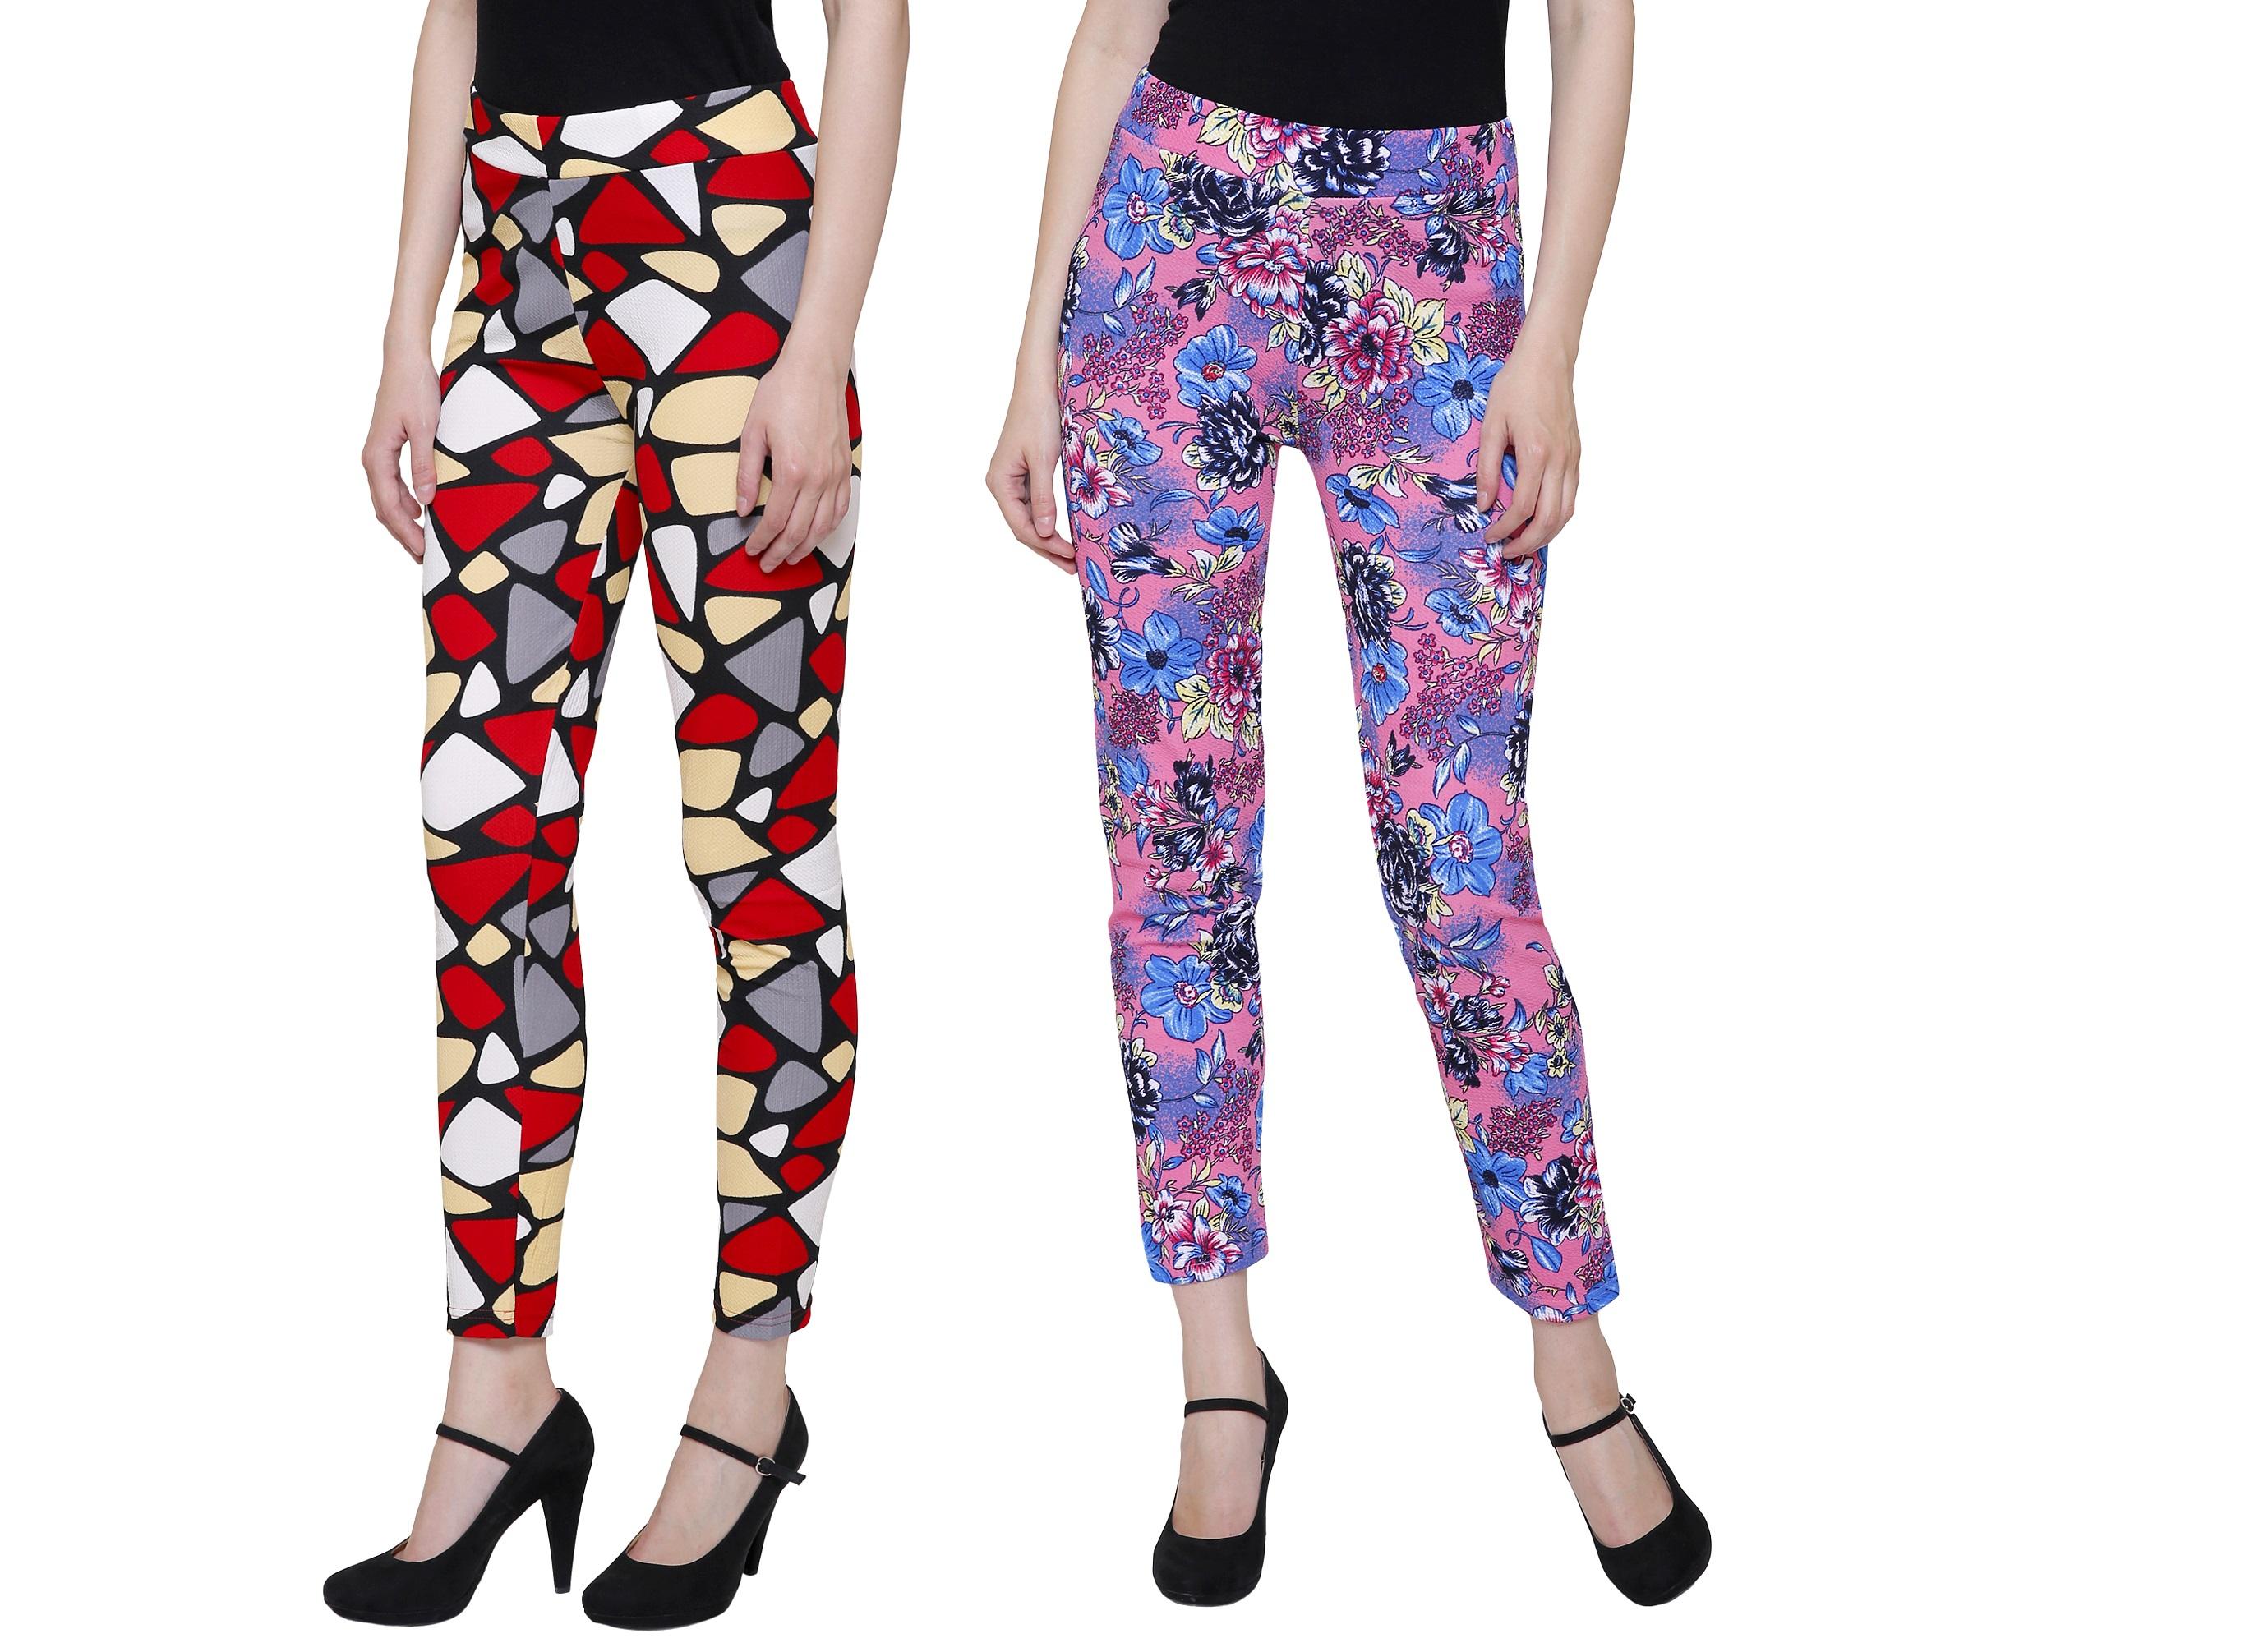 e32bb523eb26c5 Online Shopping Site : Buy Mobiles, Electronics, Fashion, Clothing ...